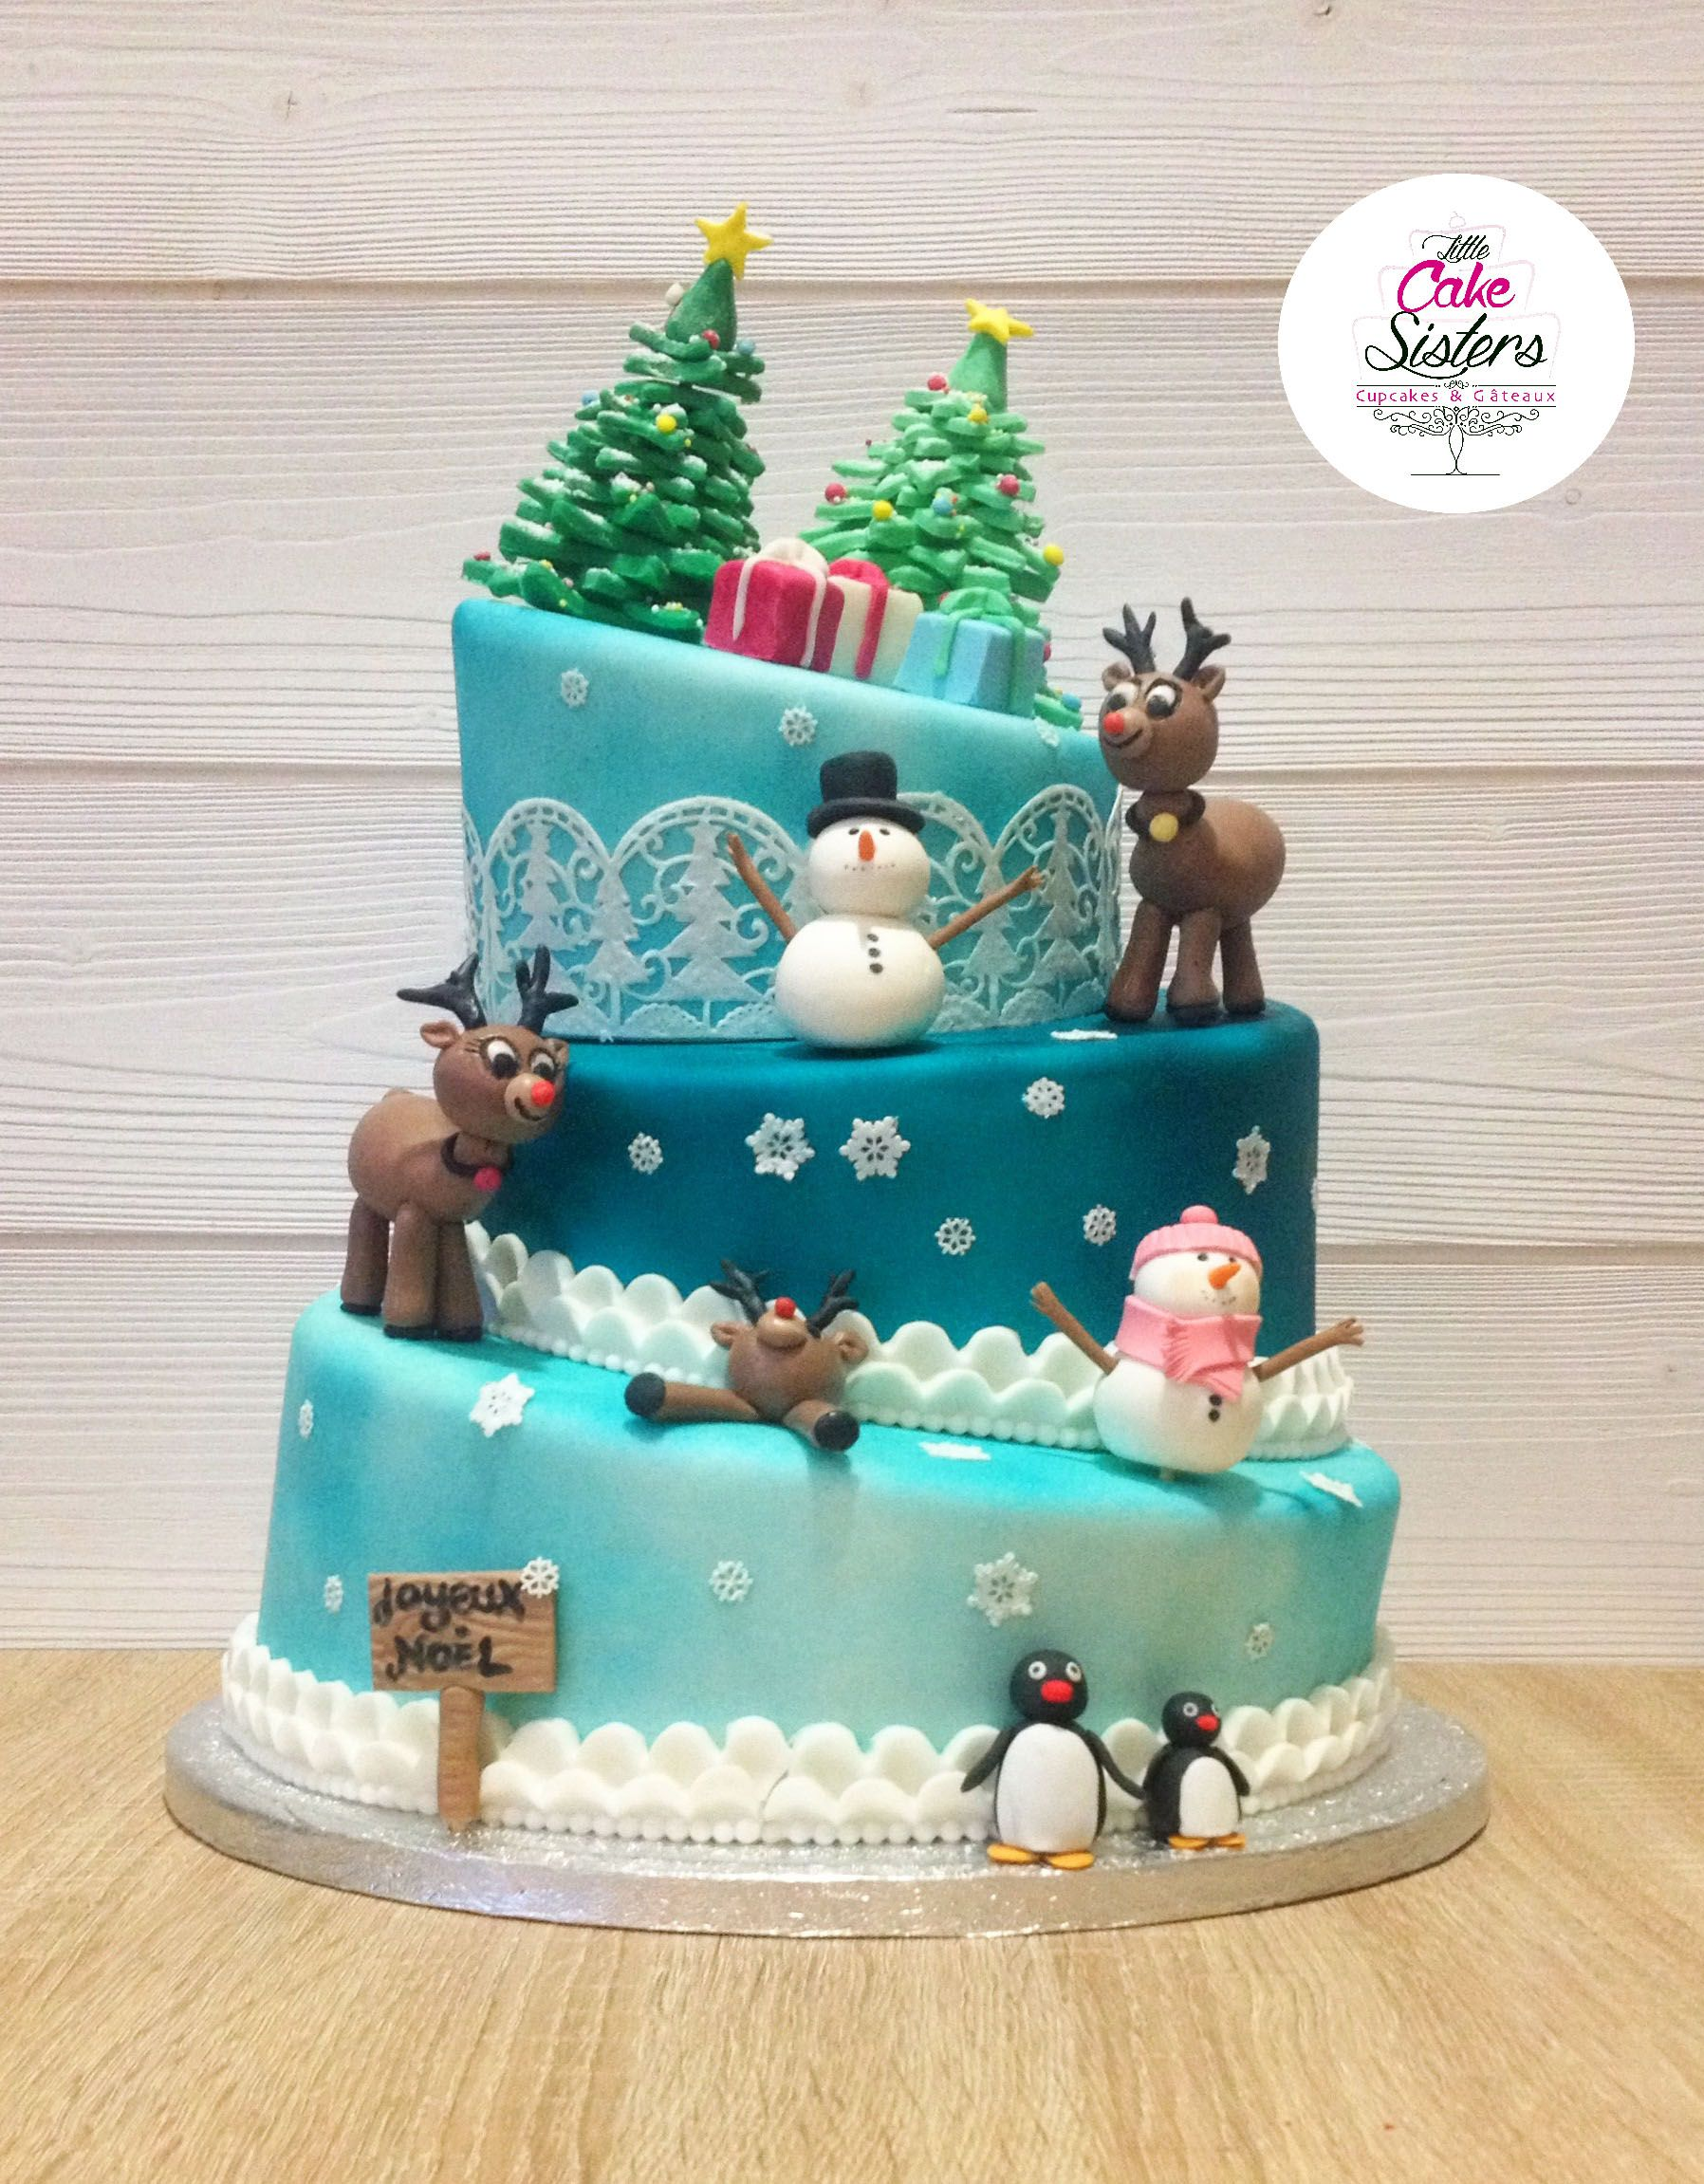 gâteau de noël, christmas cake design, cerf pâte à sucre, sapin pâte à sucre | Dessert noel ...